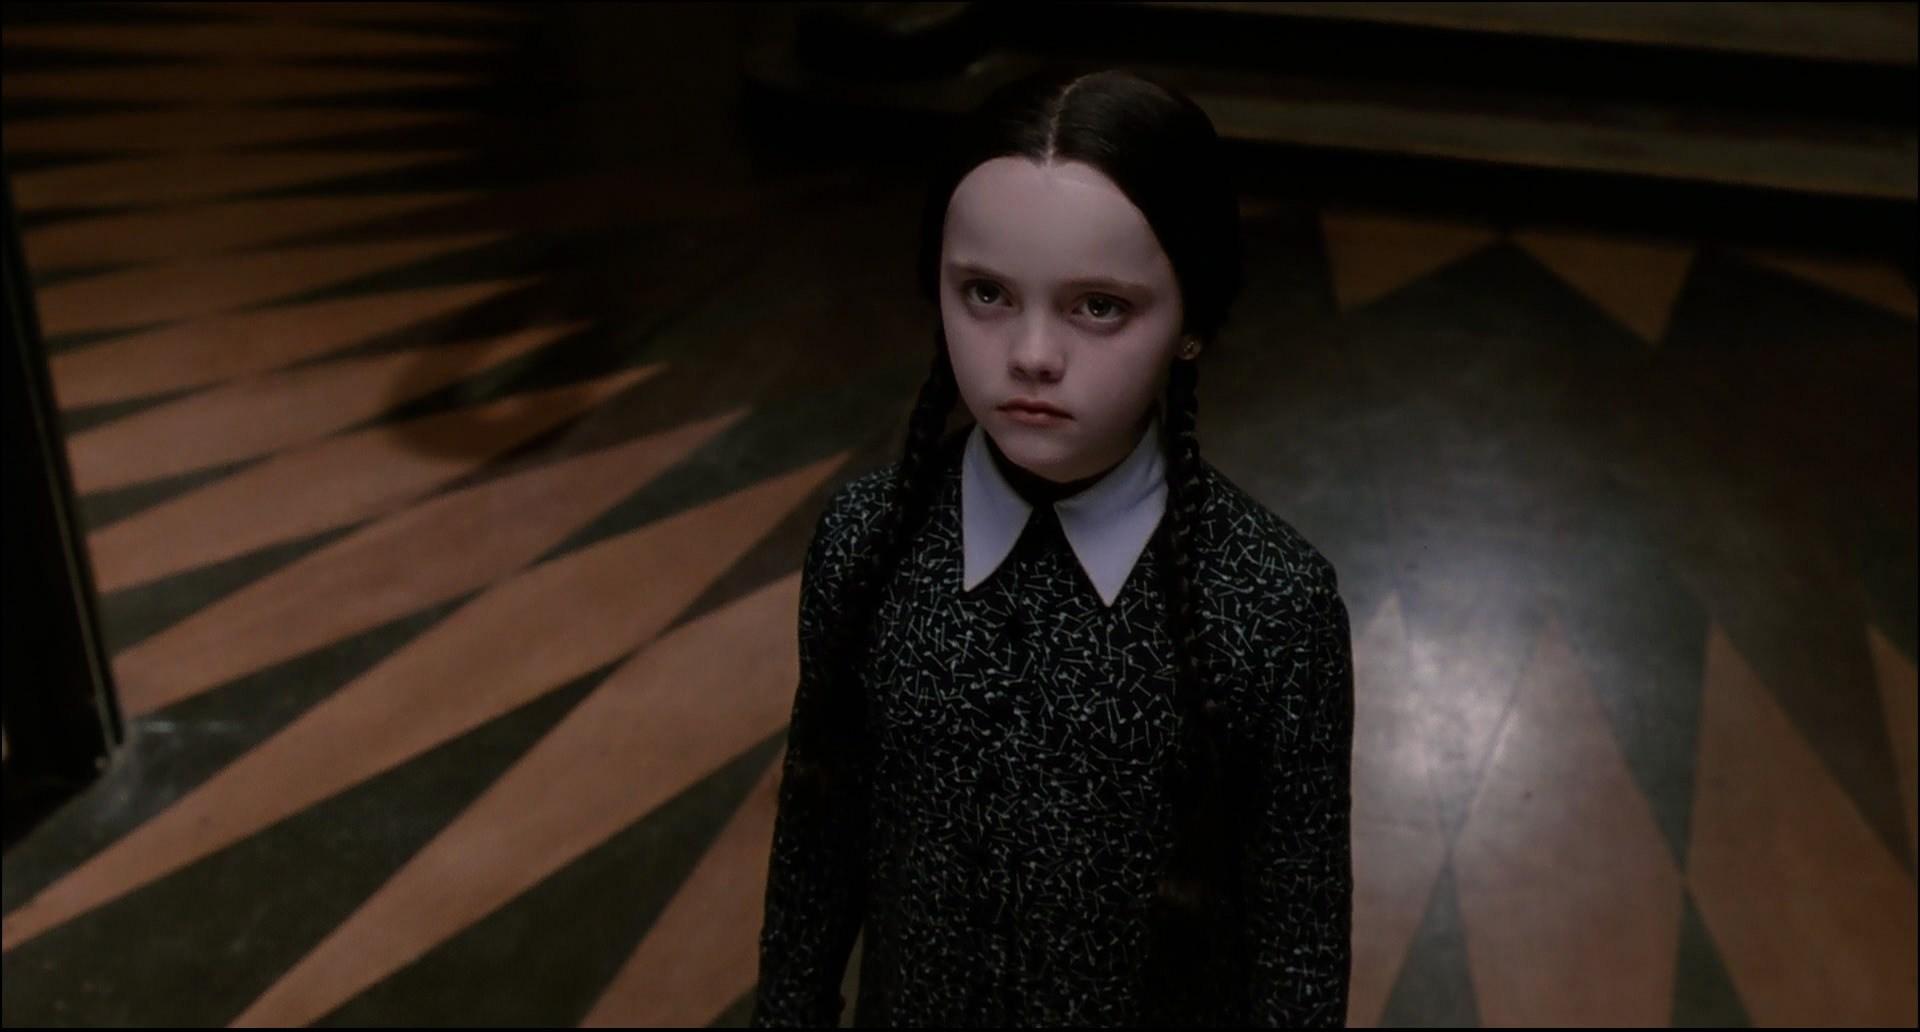 Christina Ricci in The Addams Family (1991)